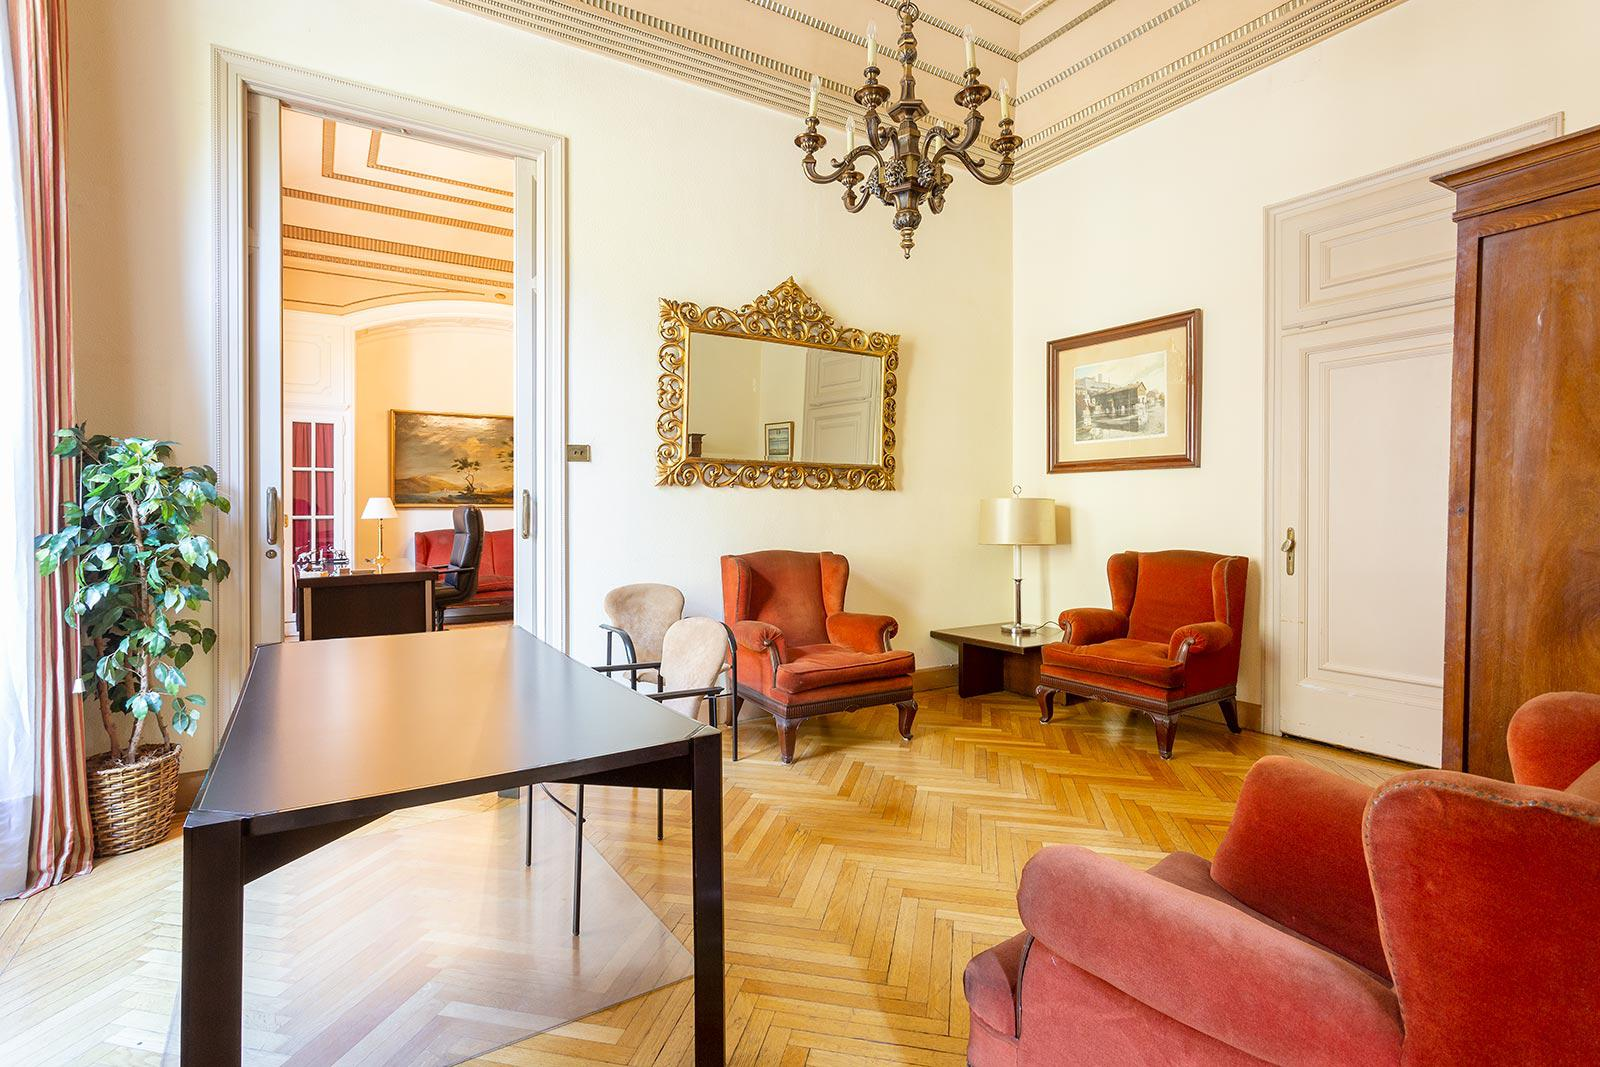 214993 Apartamento en venda en Eixample, Dreta Eixample 4